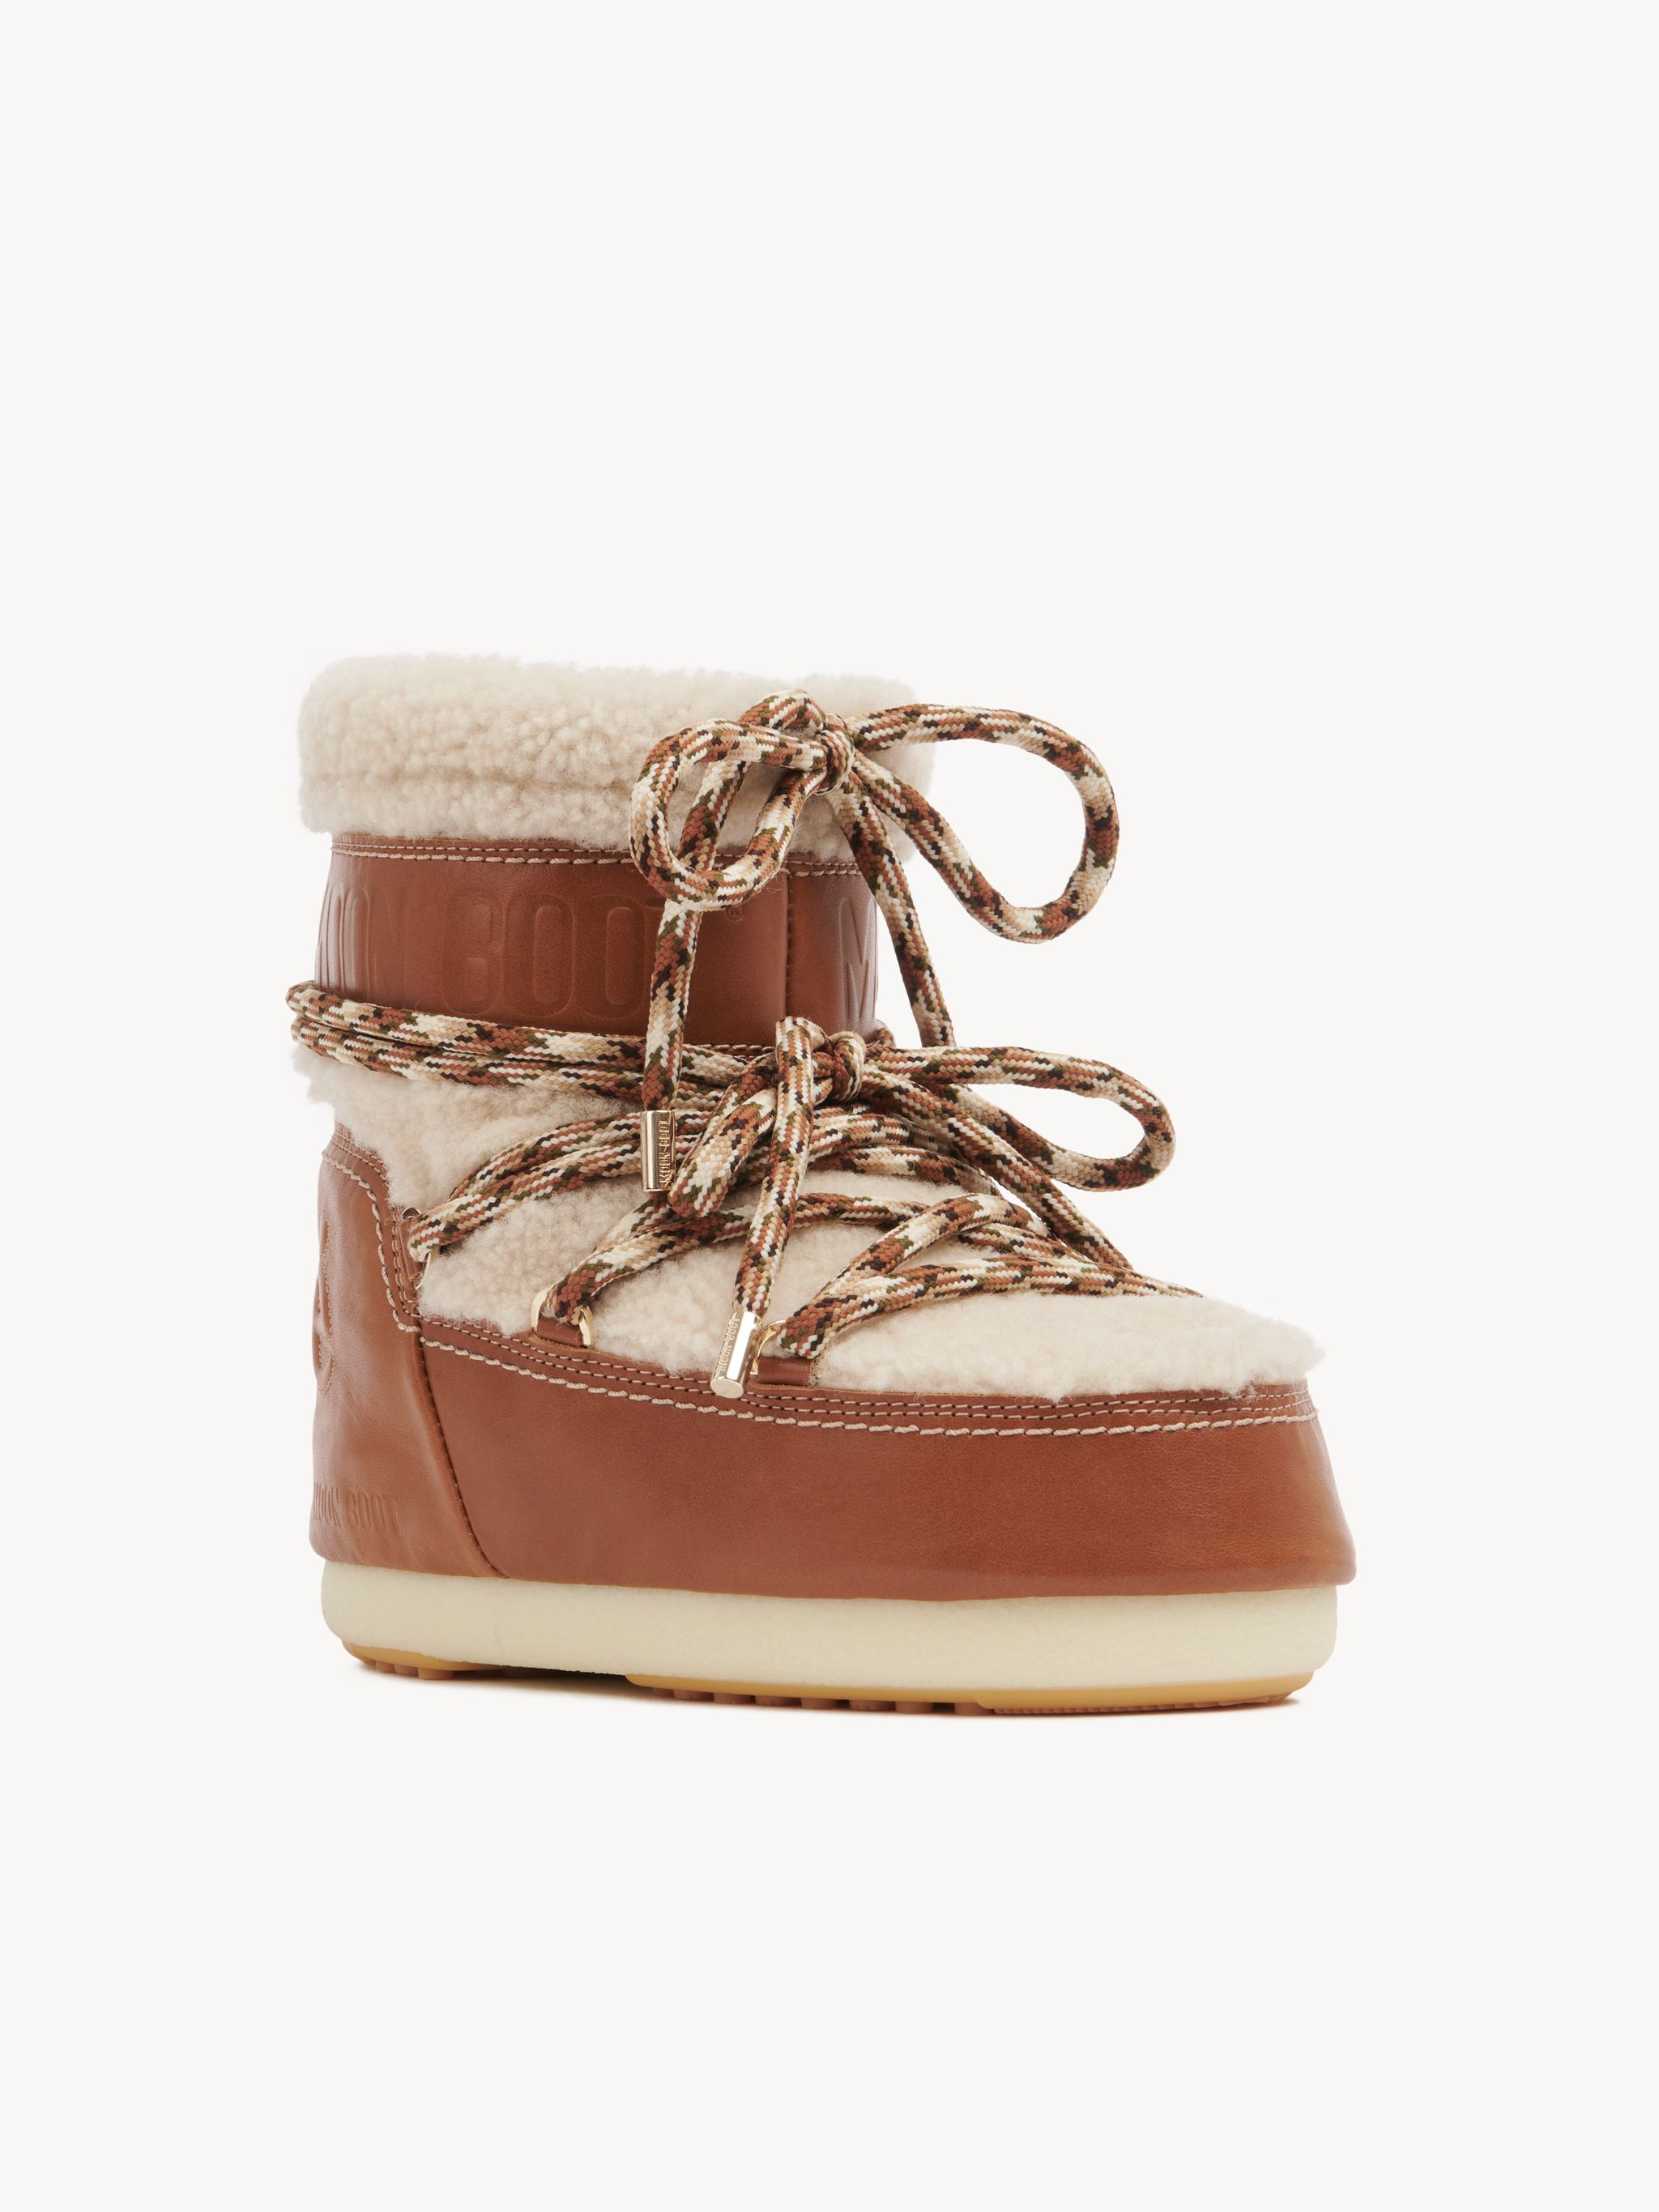 Chloé Cream Shearling Boots